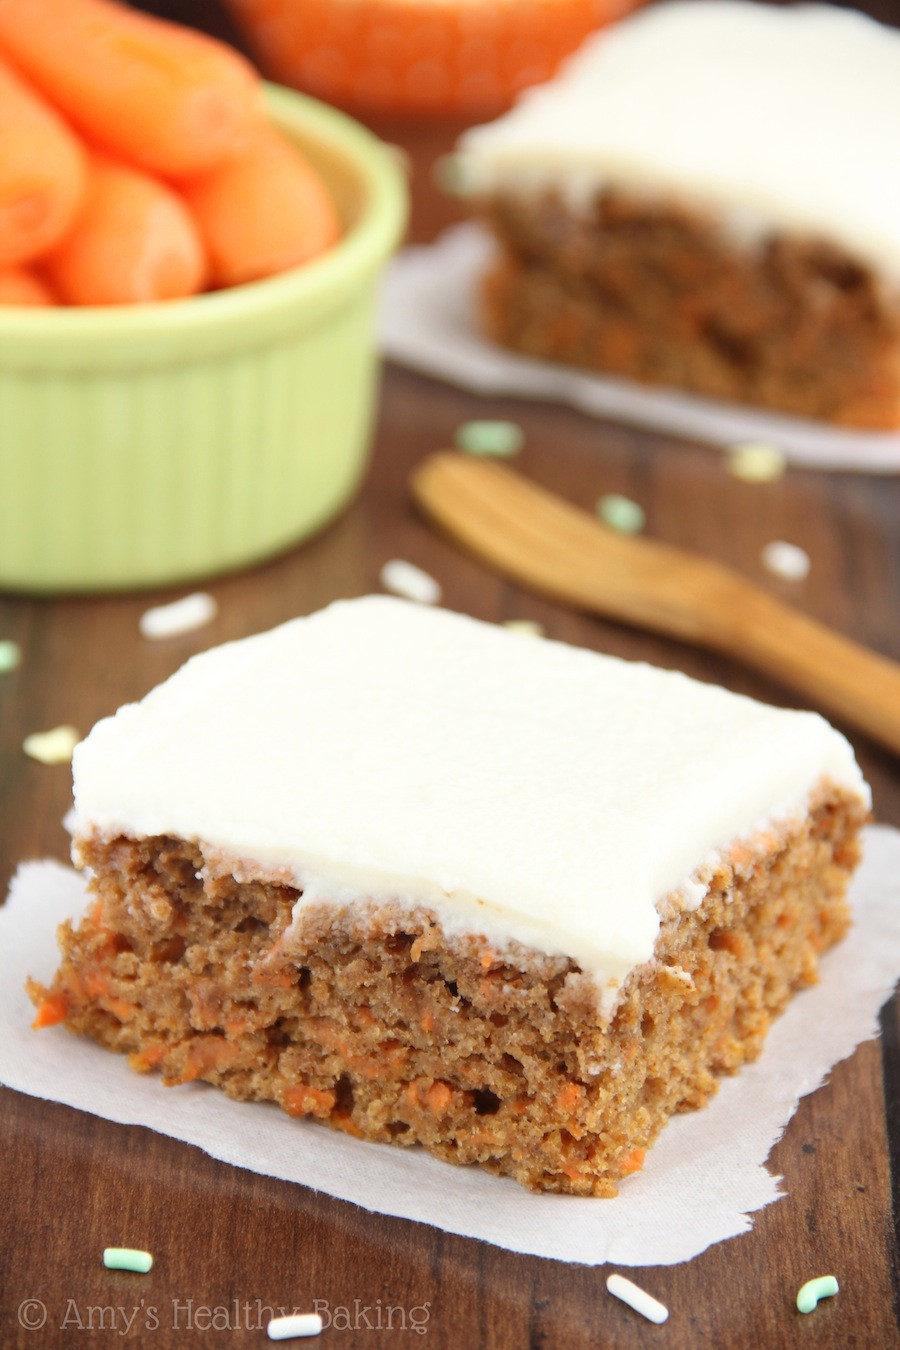 Healthy Baked Desserts  baked carrot dessert